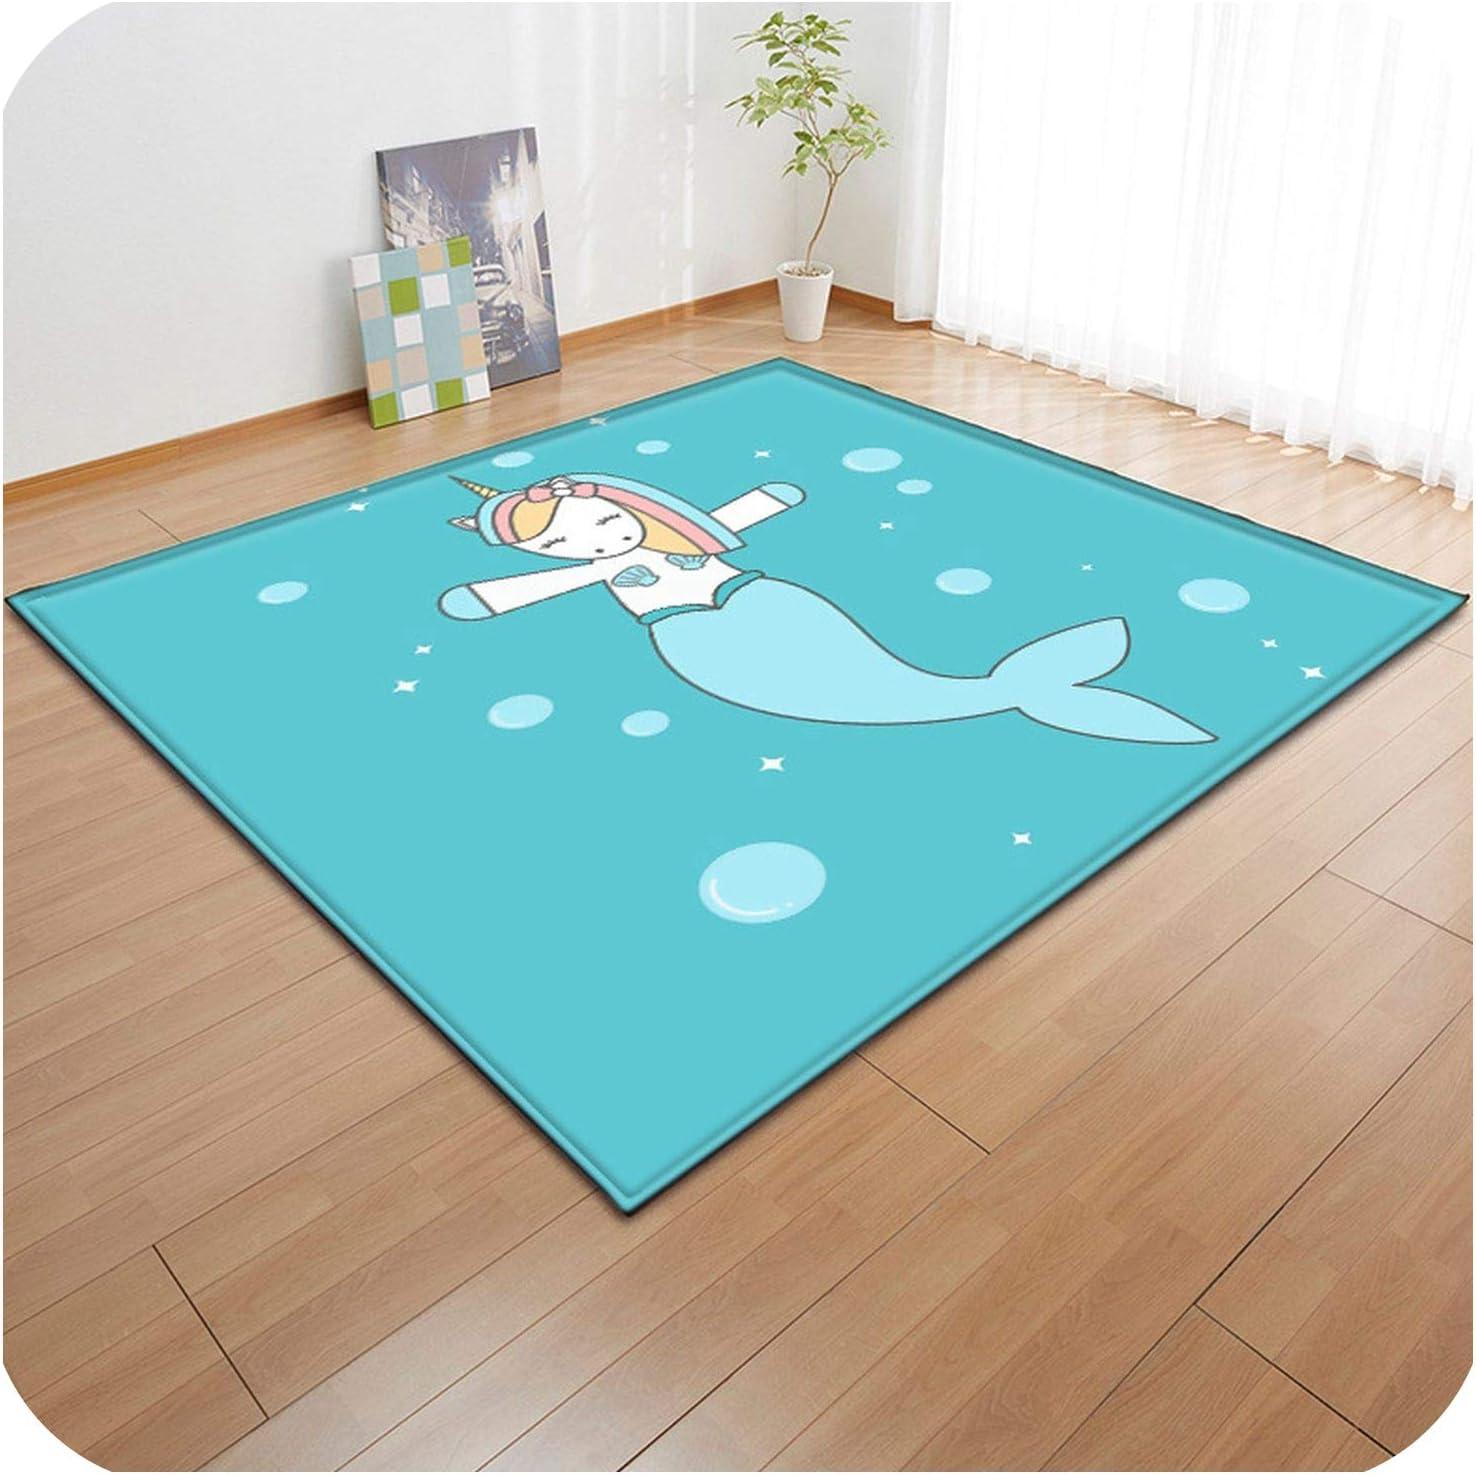 3D Non-Slip Rugs Flannel Rug Memory Foam Carpet Baby Play Crawl Mat Large Carpets for Home Living Room/Kids Girl Room Decor,09,150X200cm